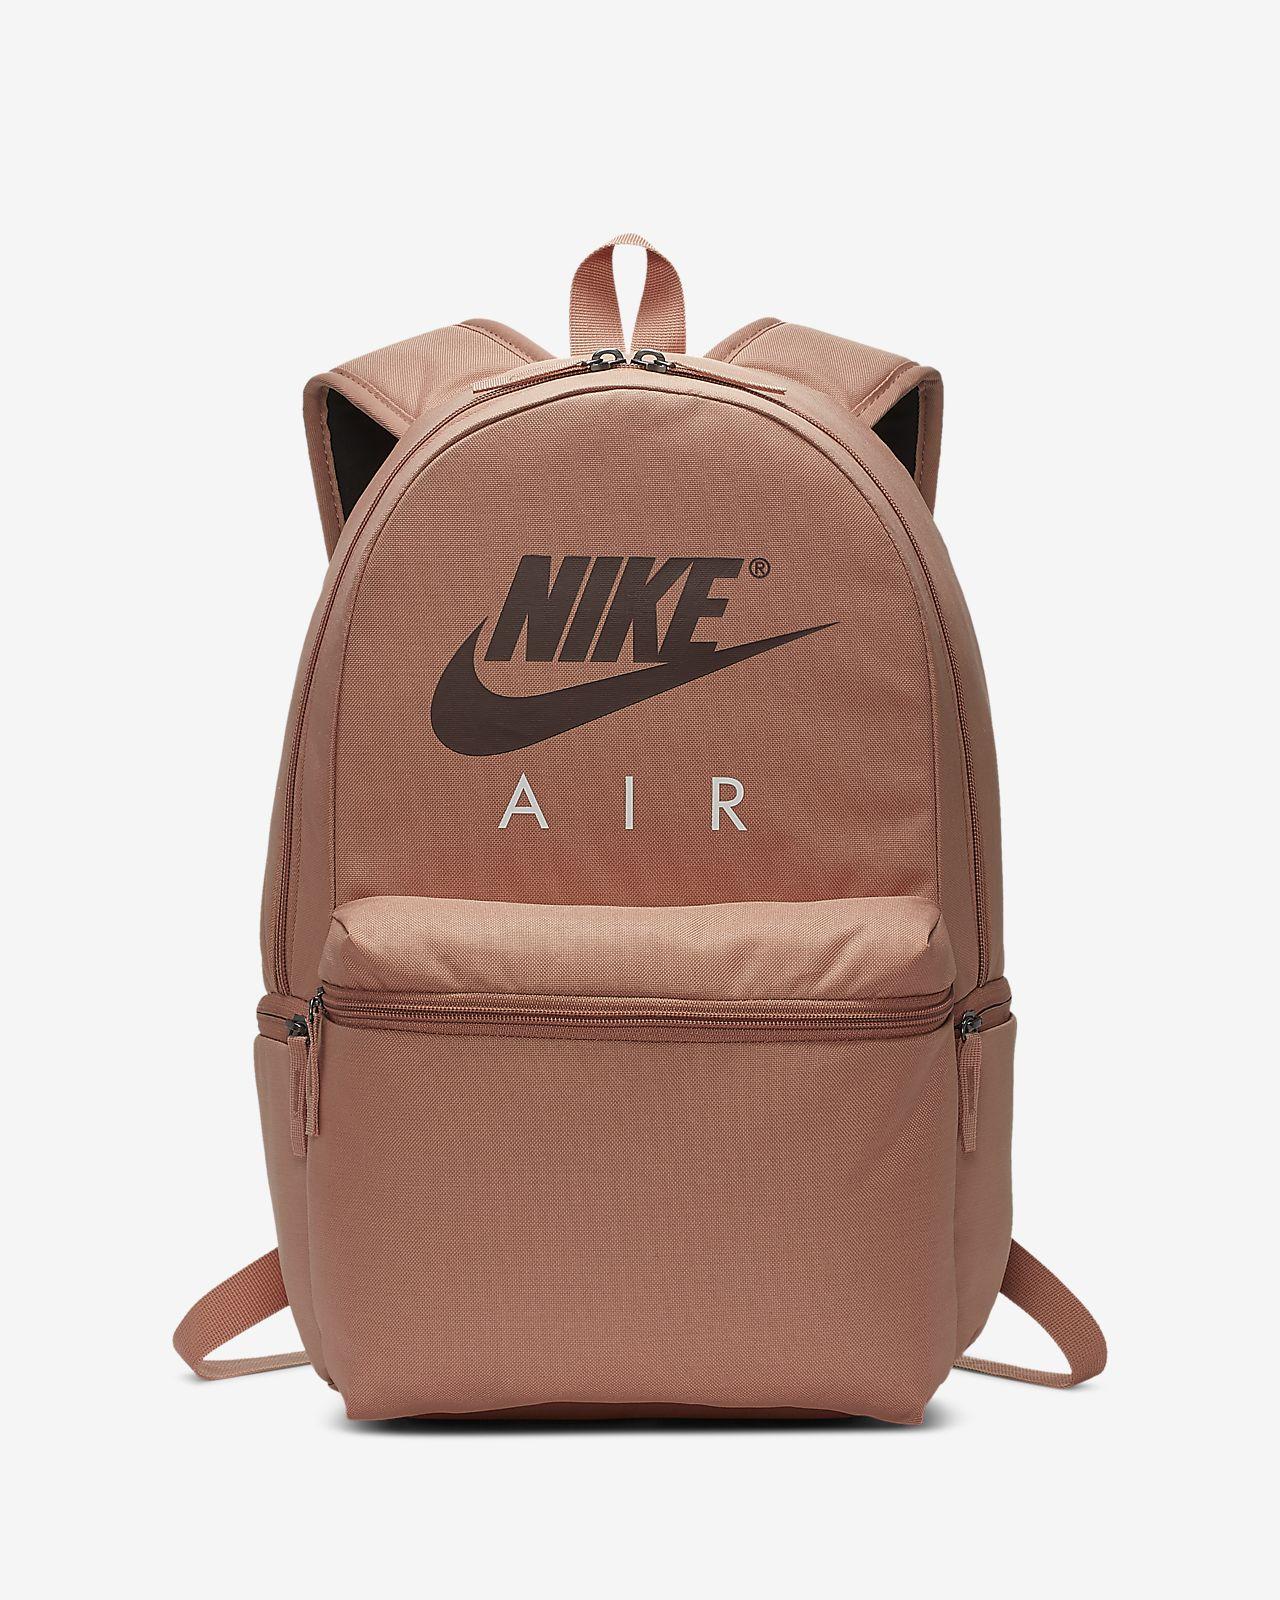 7ee47d3f145d6 Low Resolution Plecak Nike Air Plecak Nike Air